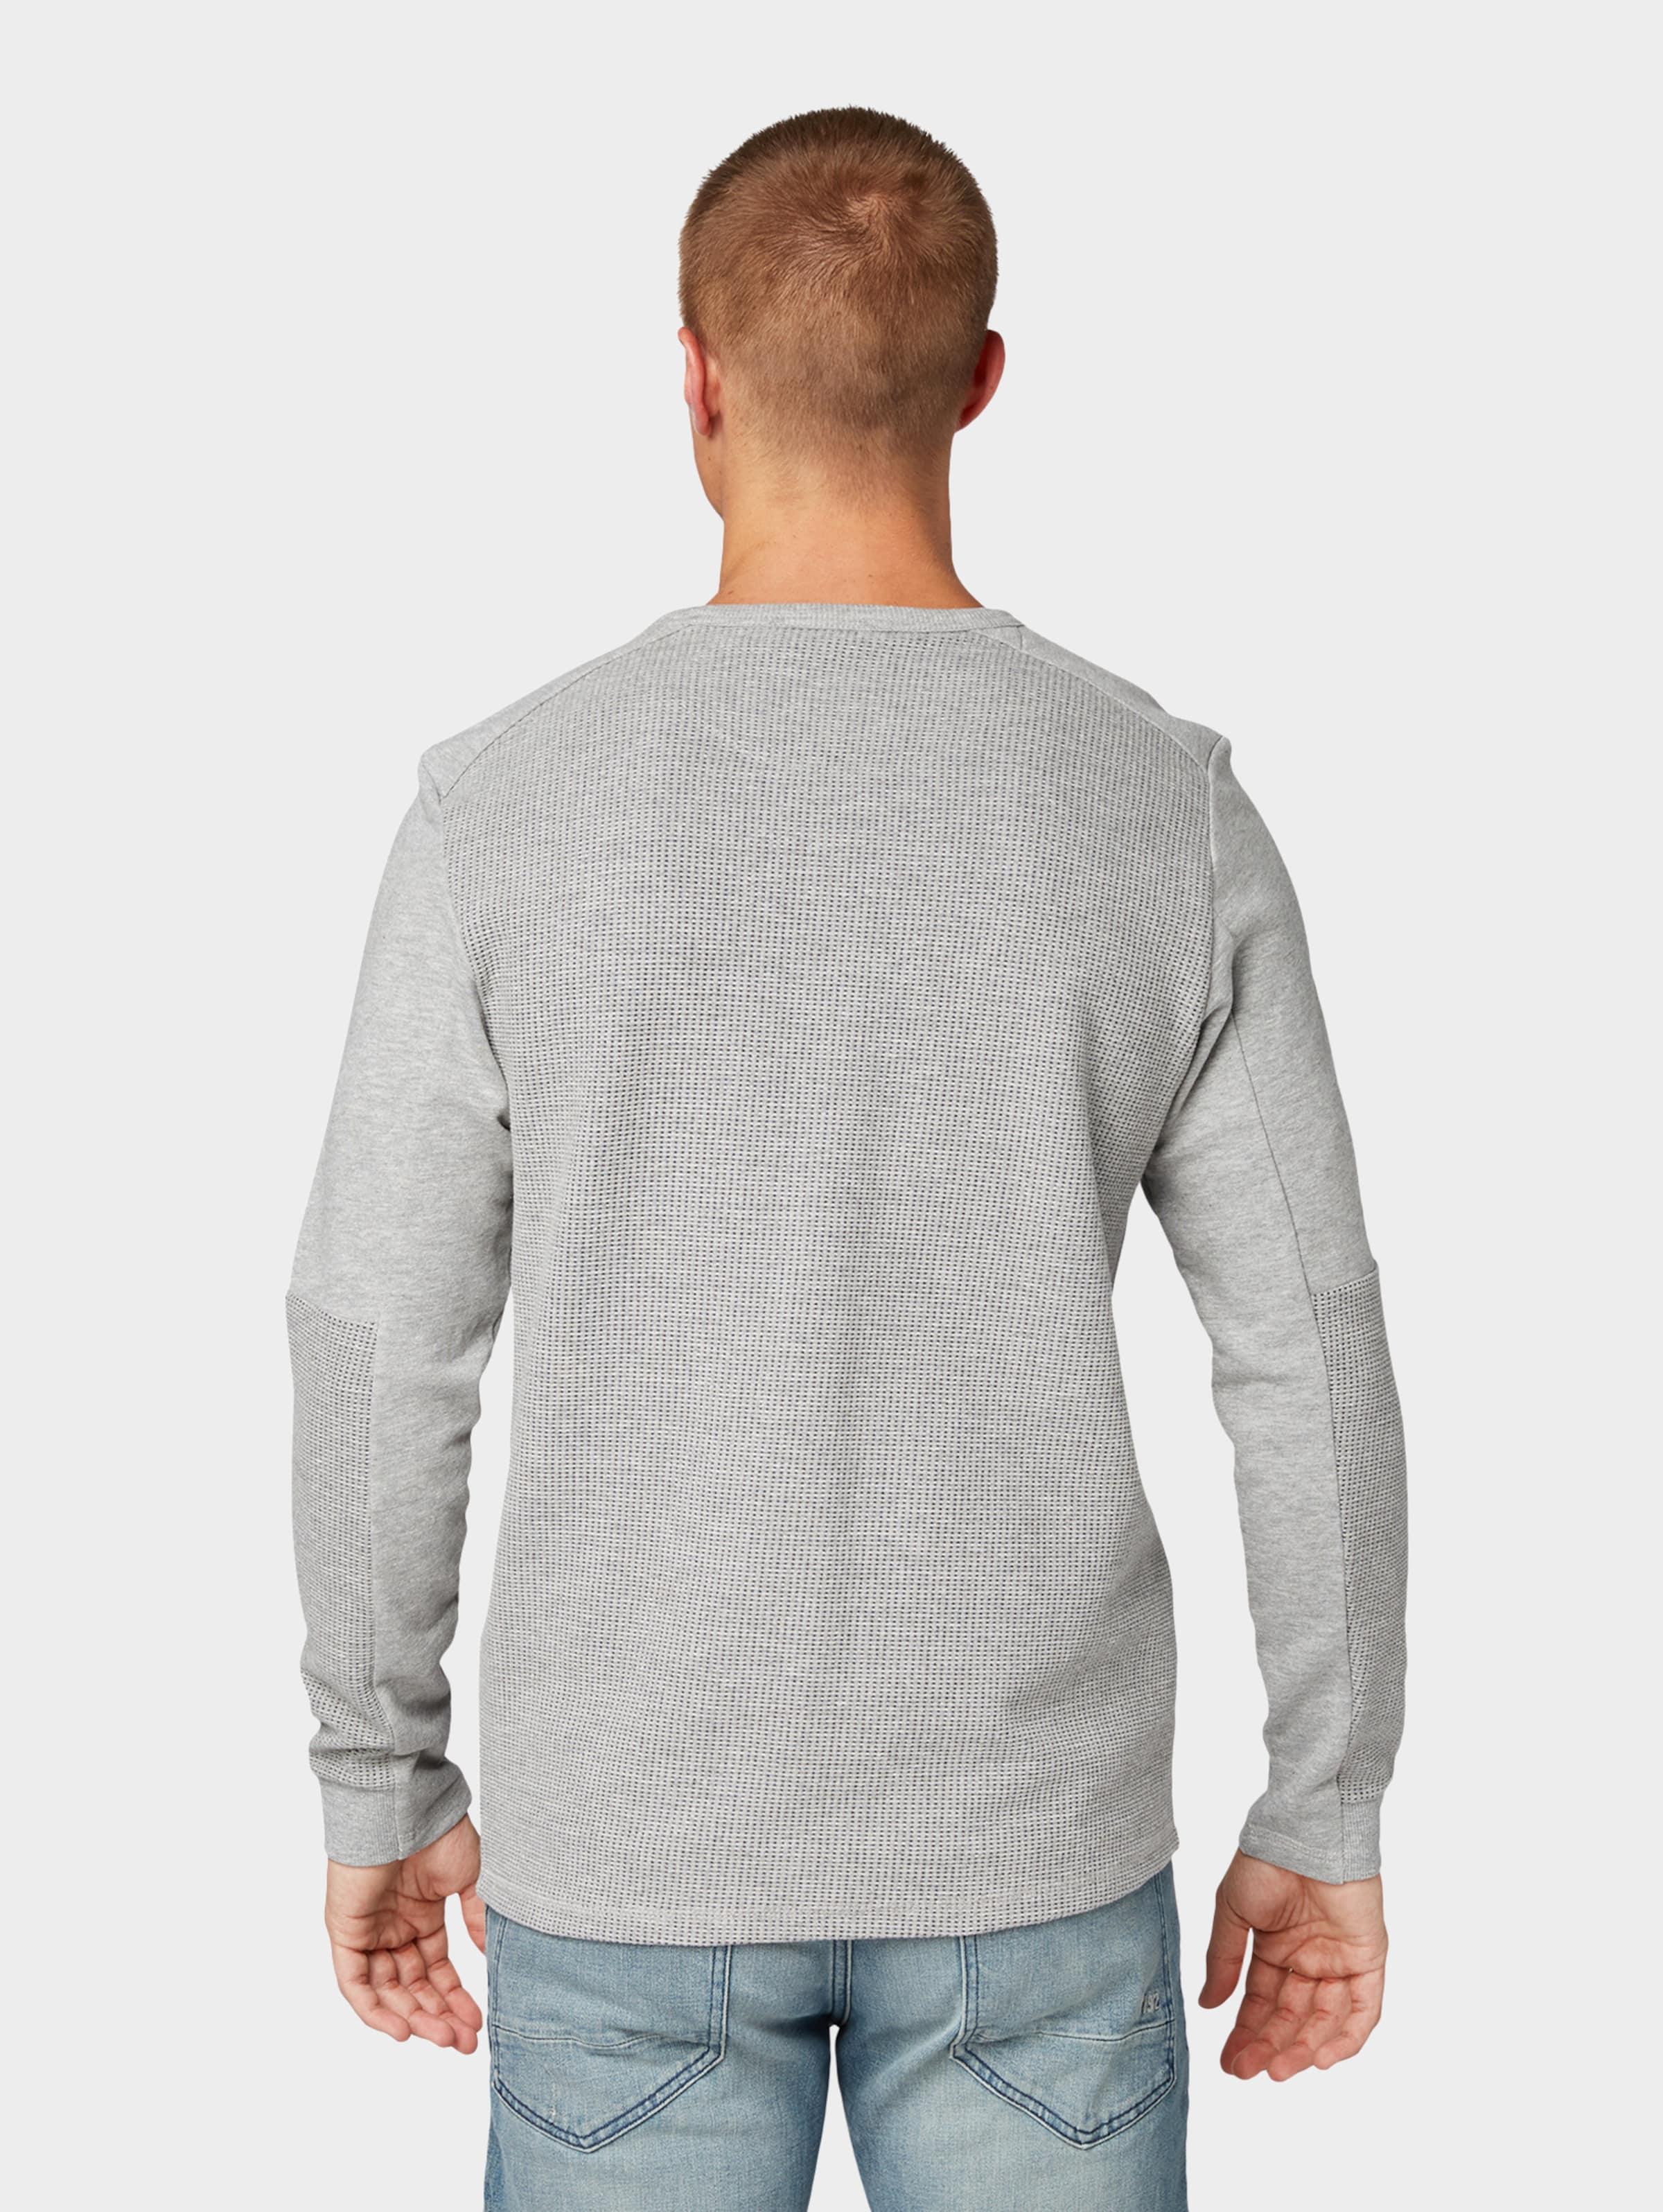 Tailor Grau Tom Sweatshirt In Tailor Sweatshirt Tom Y7gIb6vfy